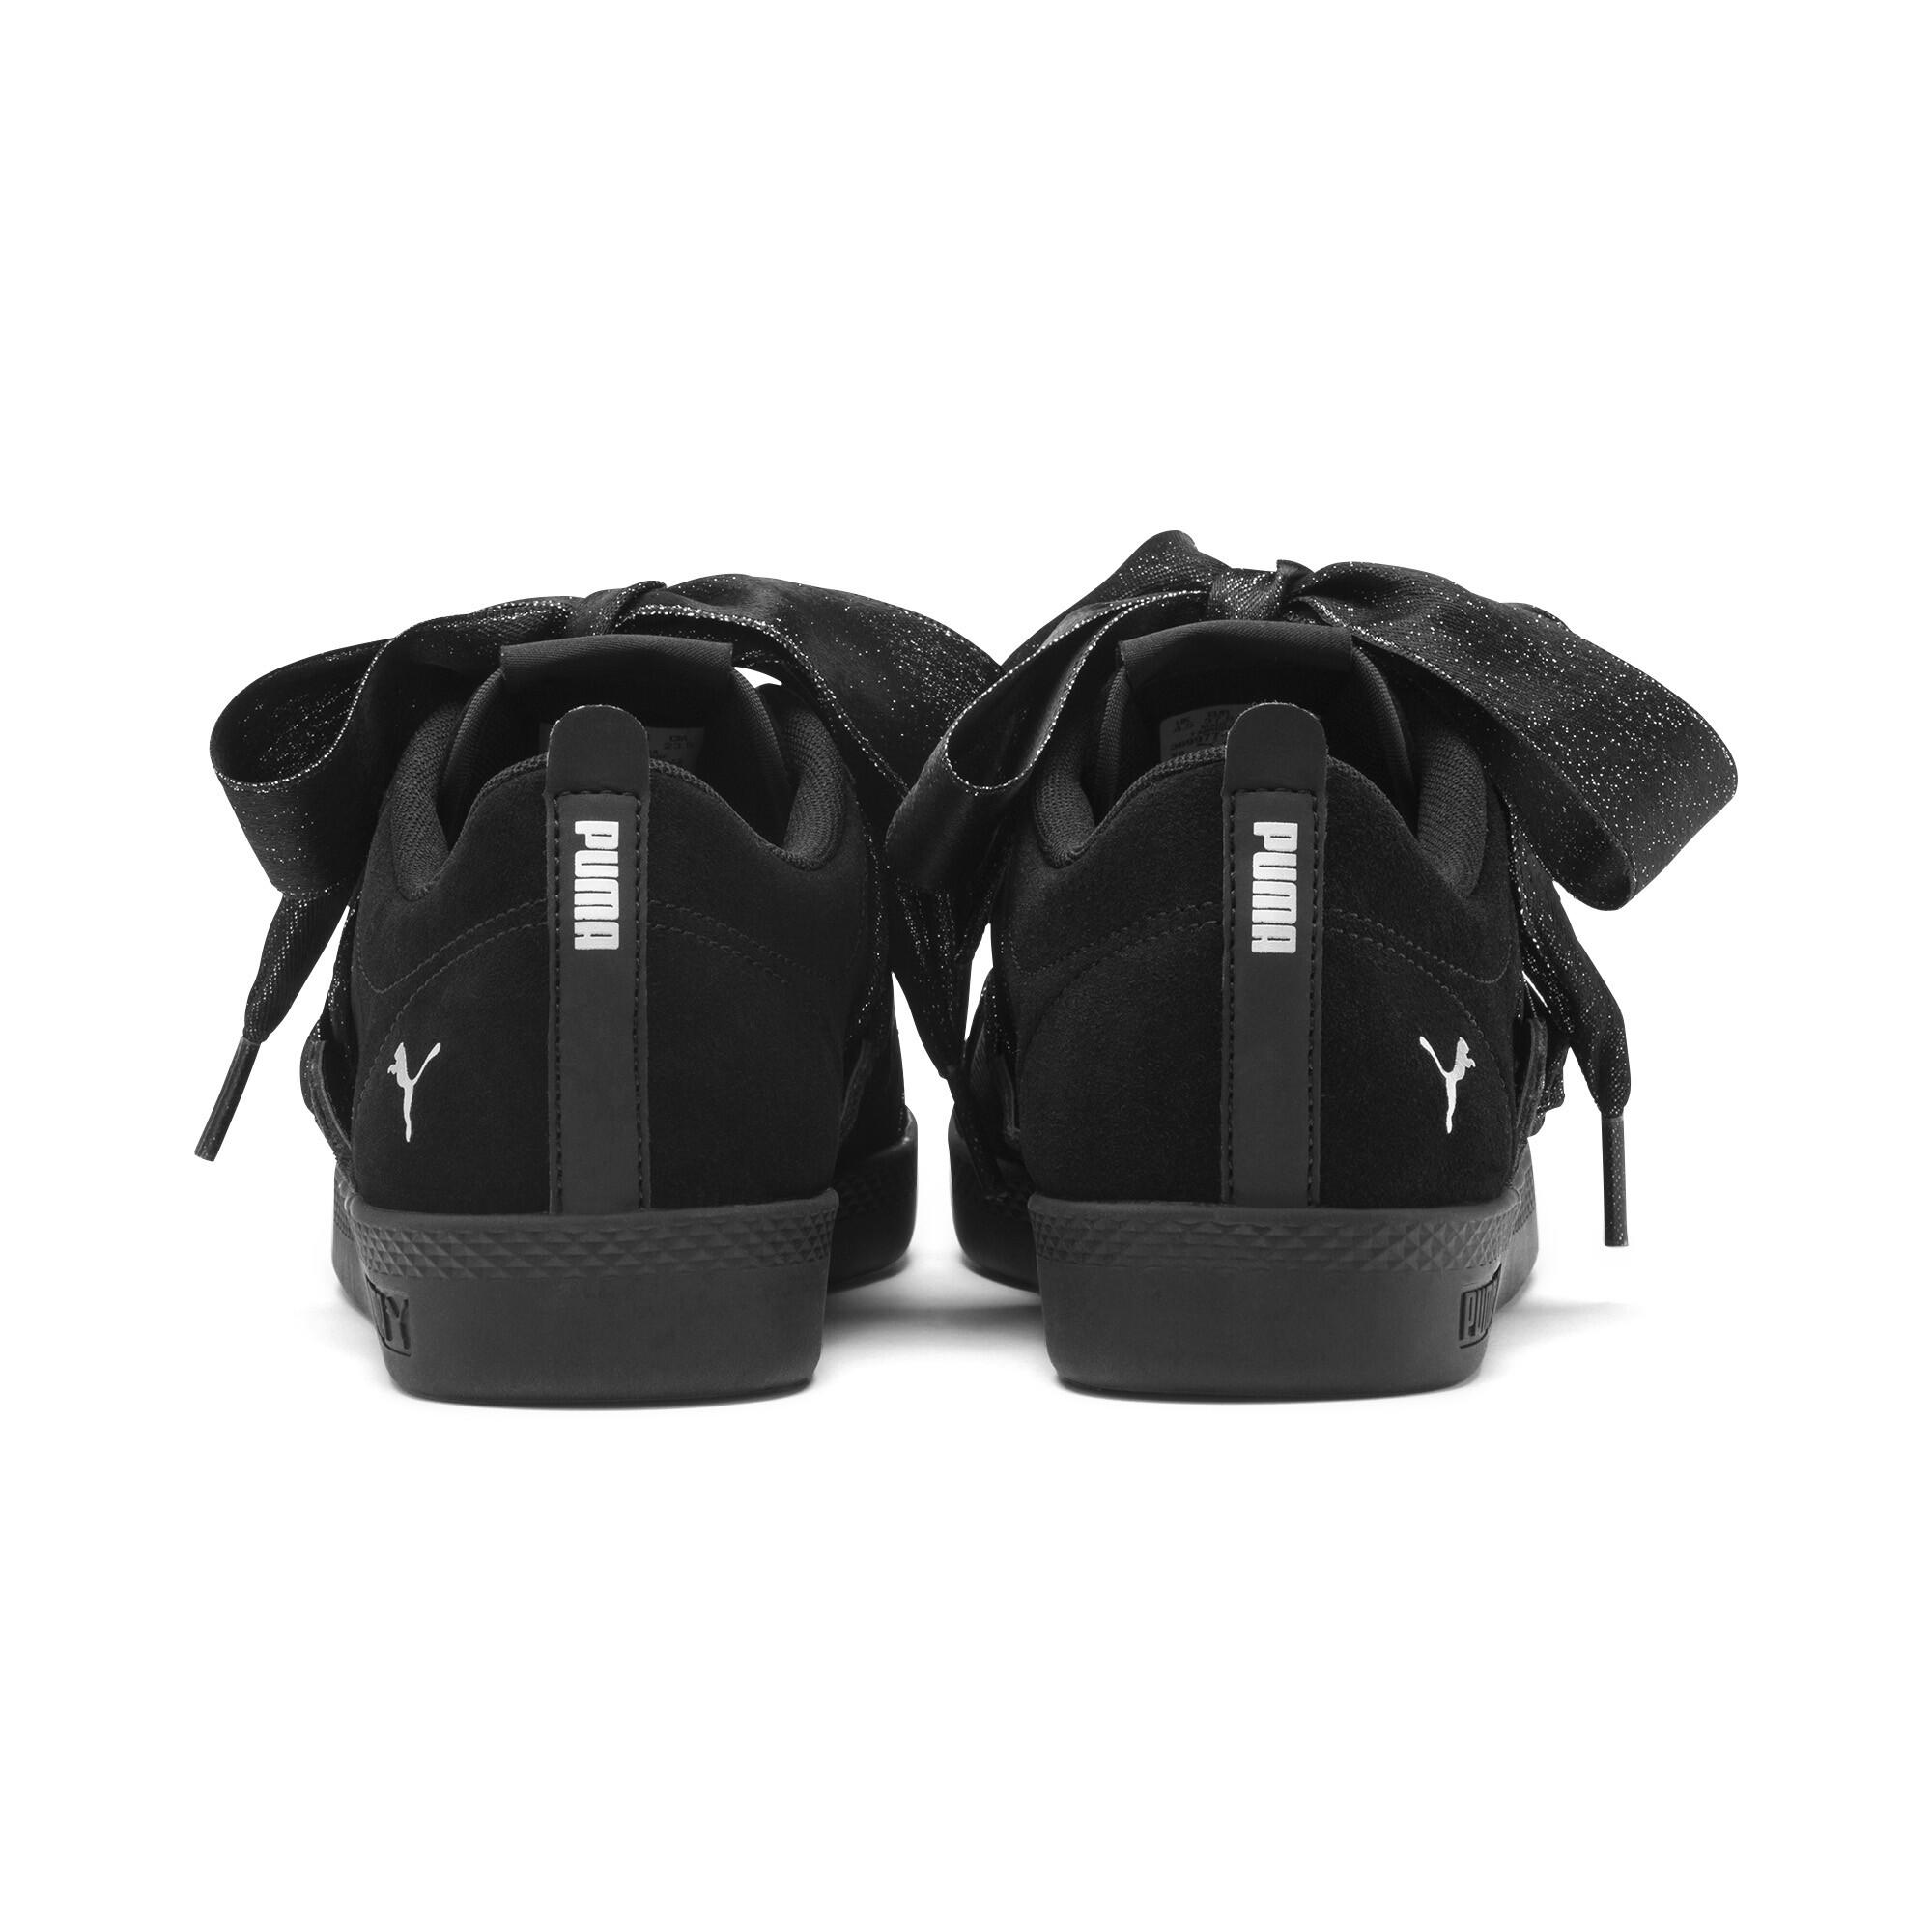 PUMA-PUMA-Smash-Astral-Buckle-Women-s-Sneakers-Women-Shoe-Basics thumbnail 10